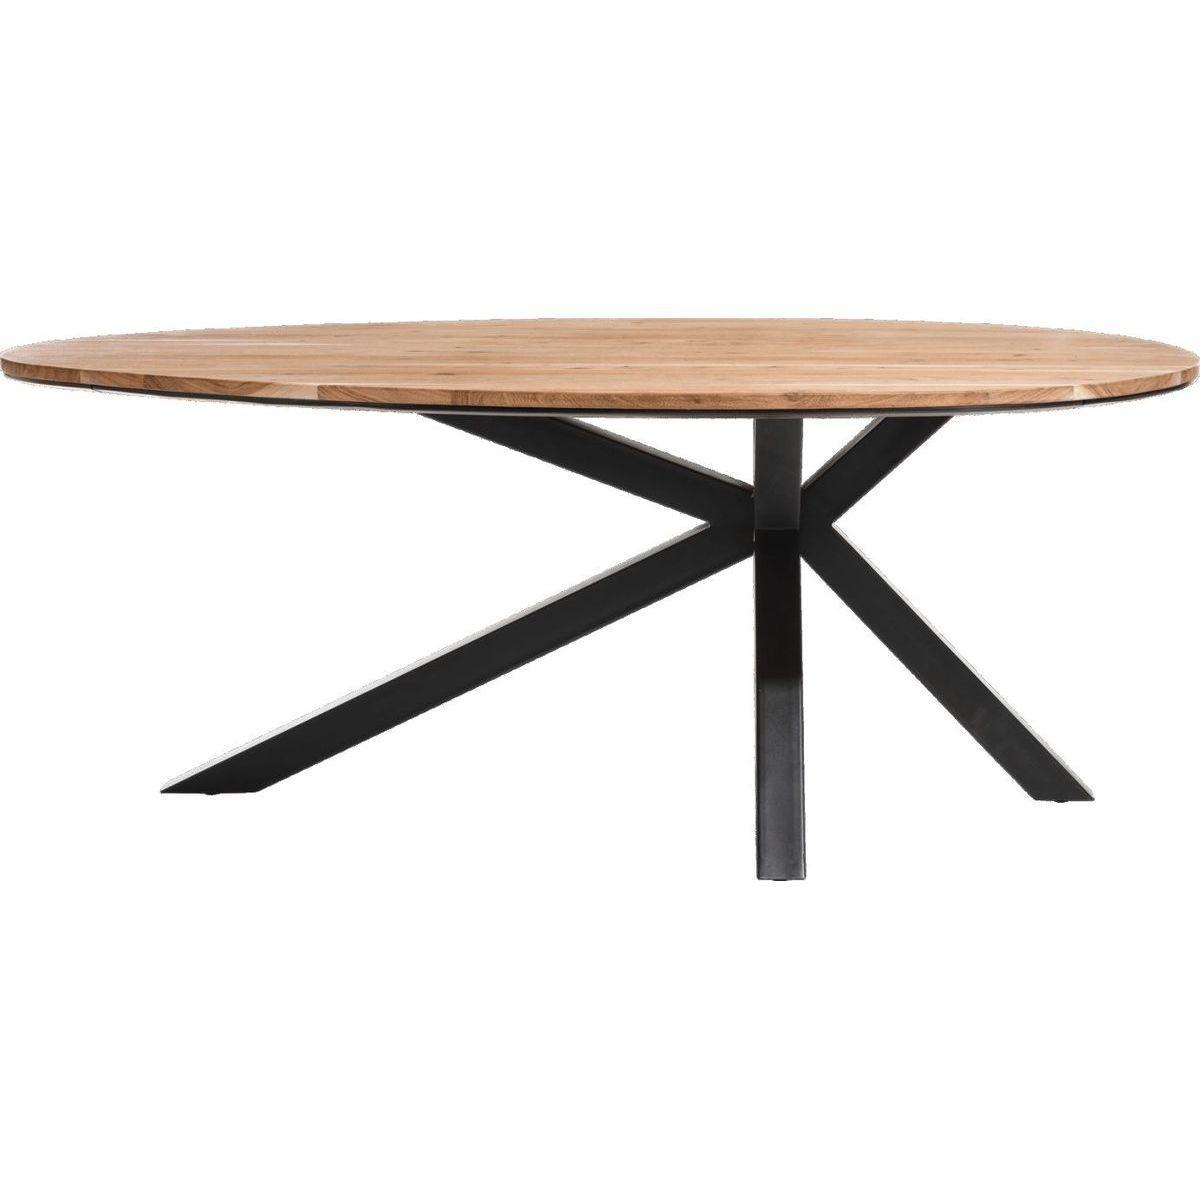 Table ovale COLOMBO Xooon bois Kikar smoked 200x120cm